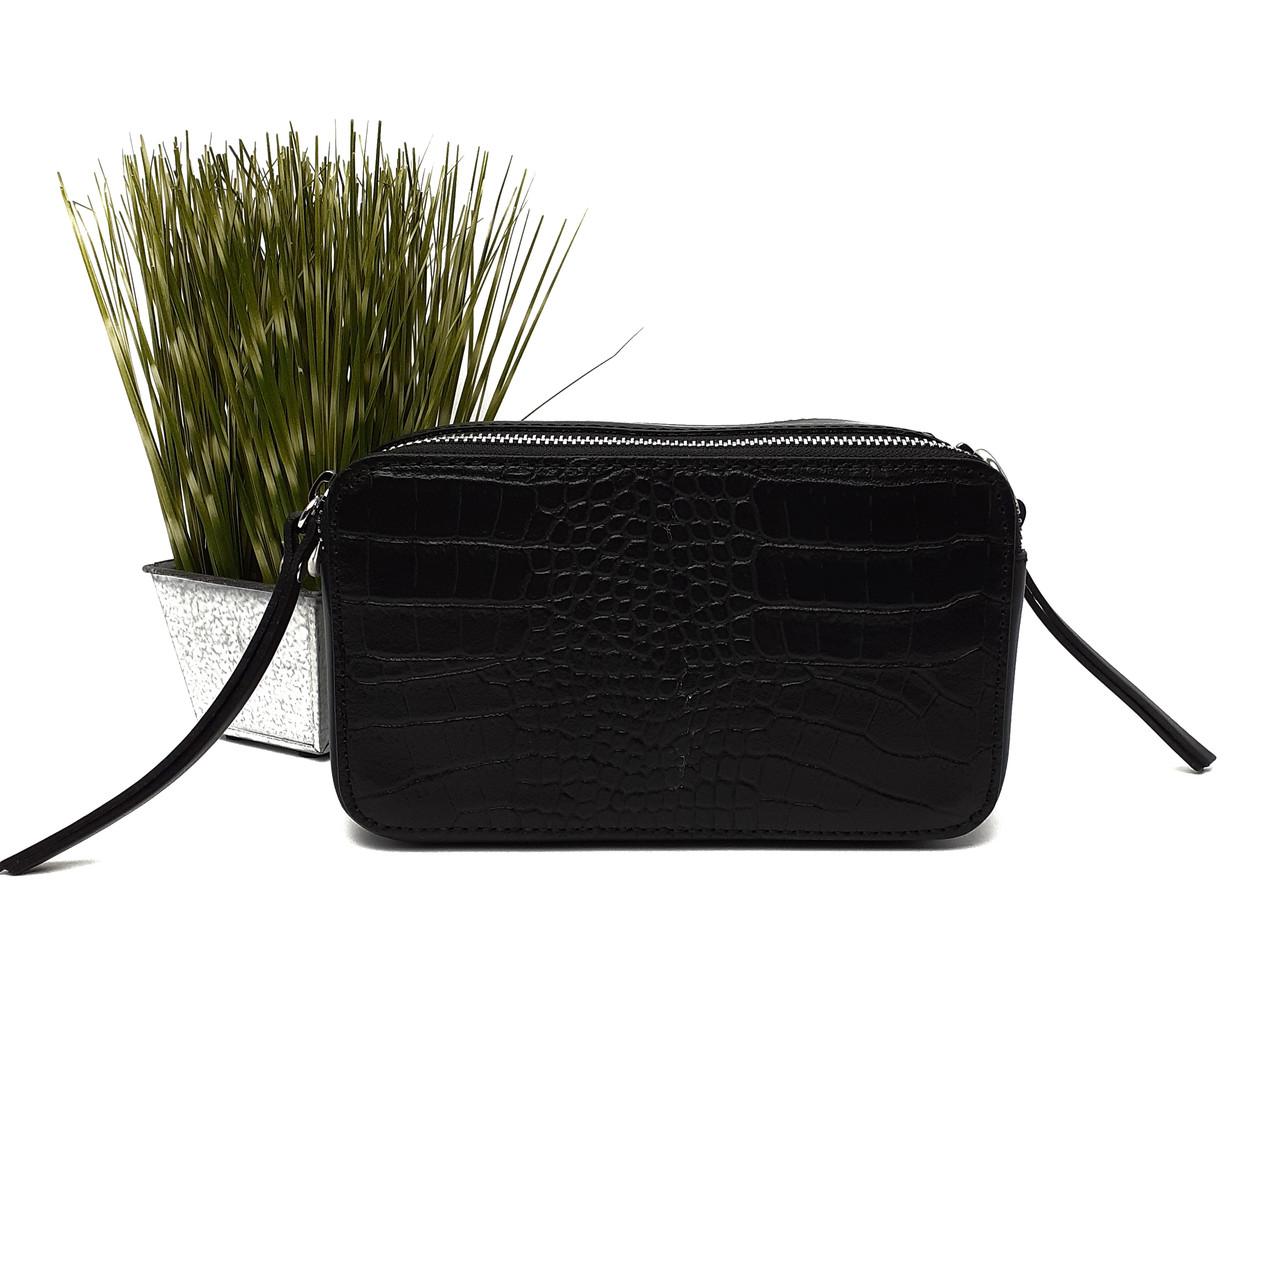 Шкіряна маленька сумка жіноча чорна Арт.4503 V. P. Італія